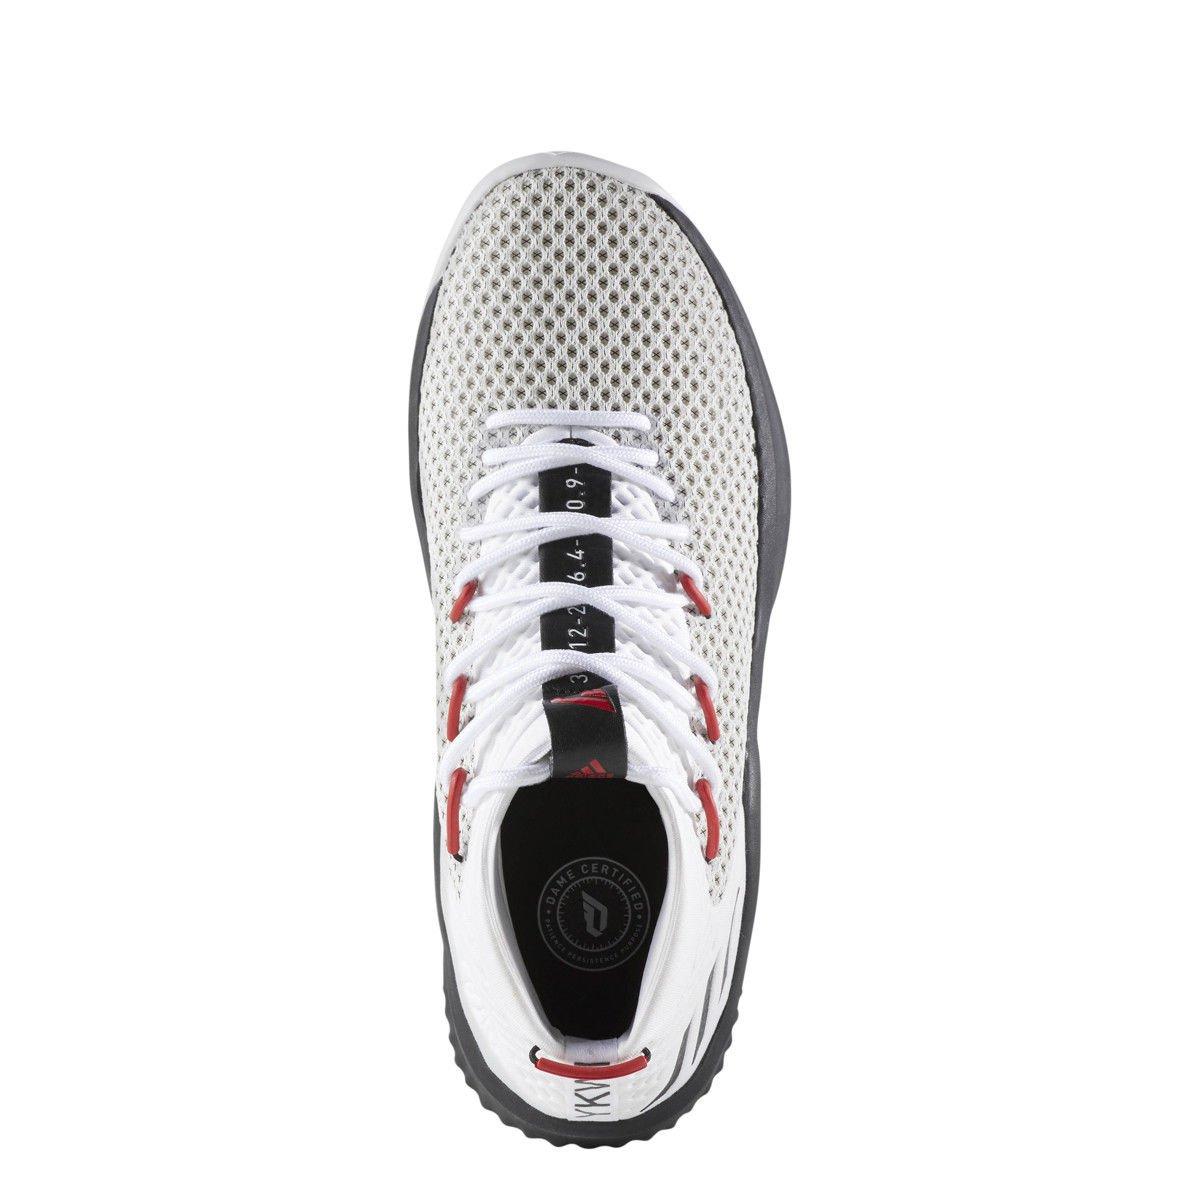 ADIDAS DAME 4 Mens White Black Red Lillard Basketball Sneaker BY3759 ... eb6cbe26f